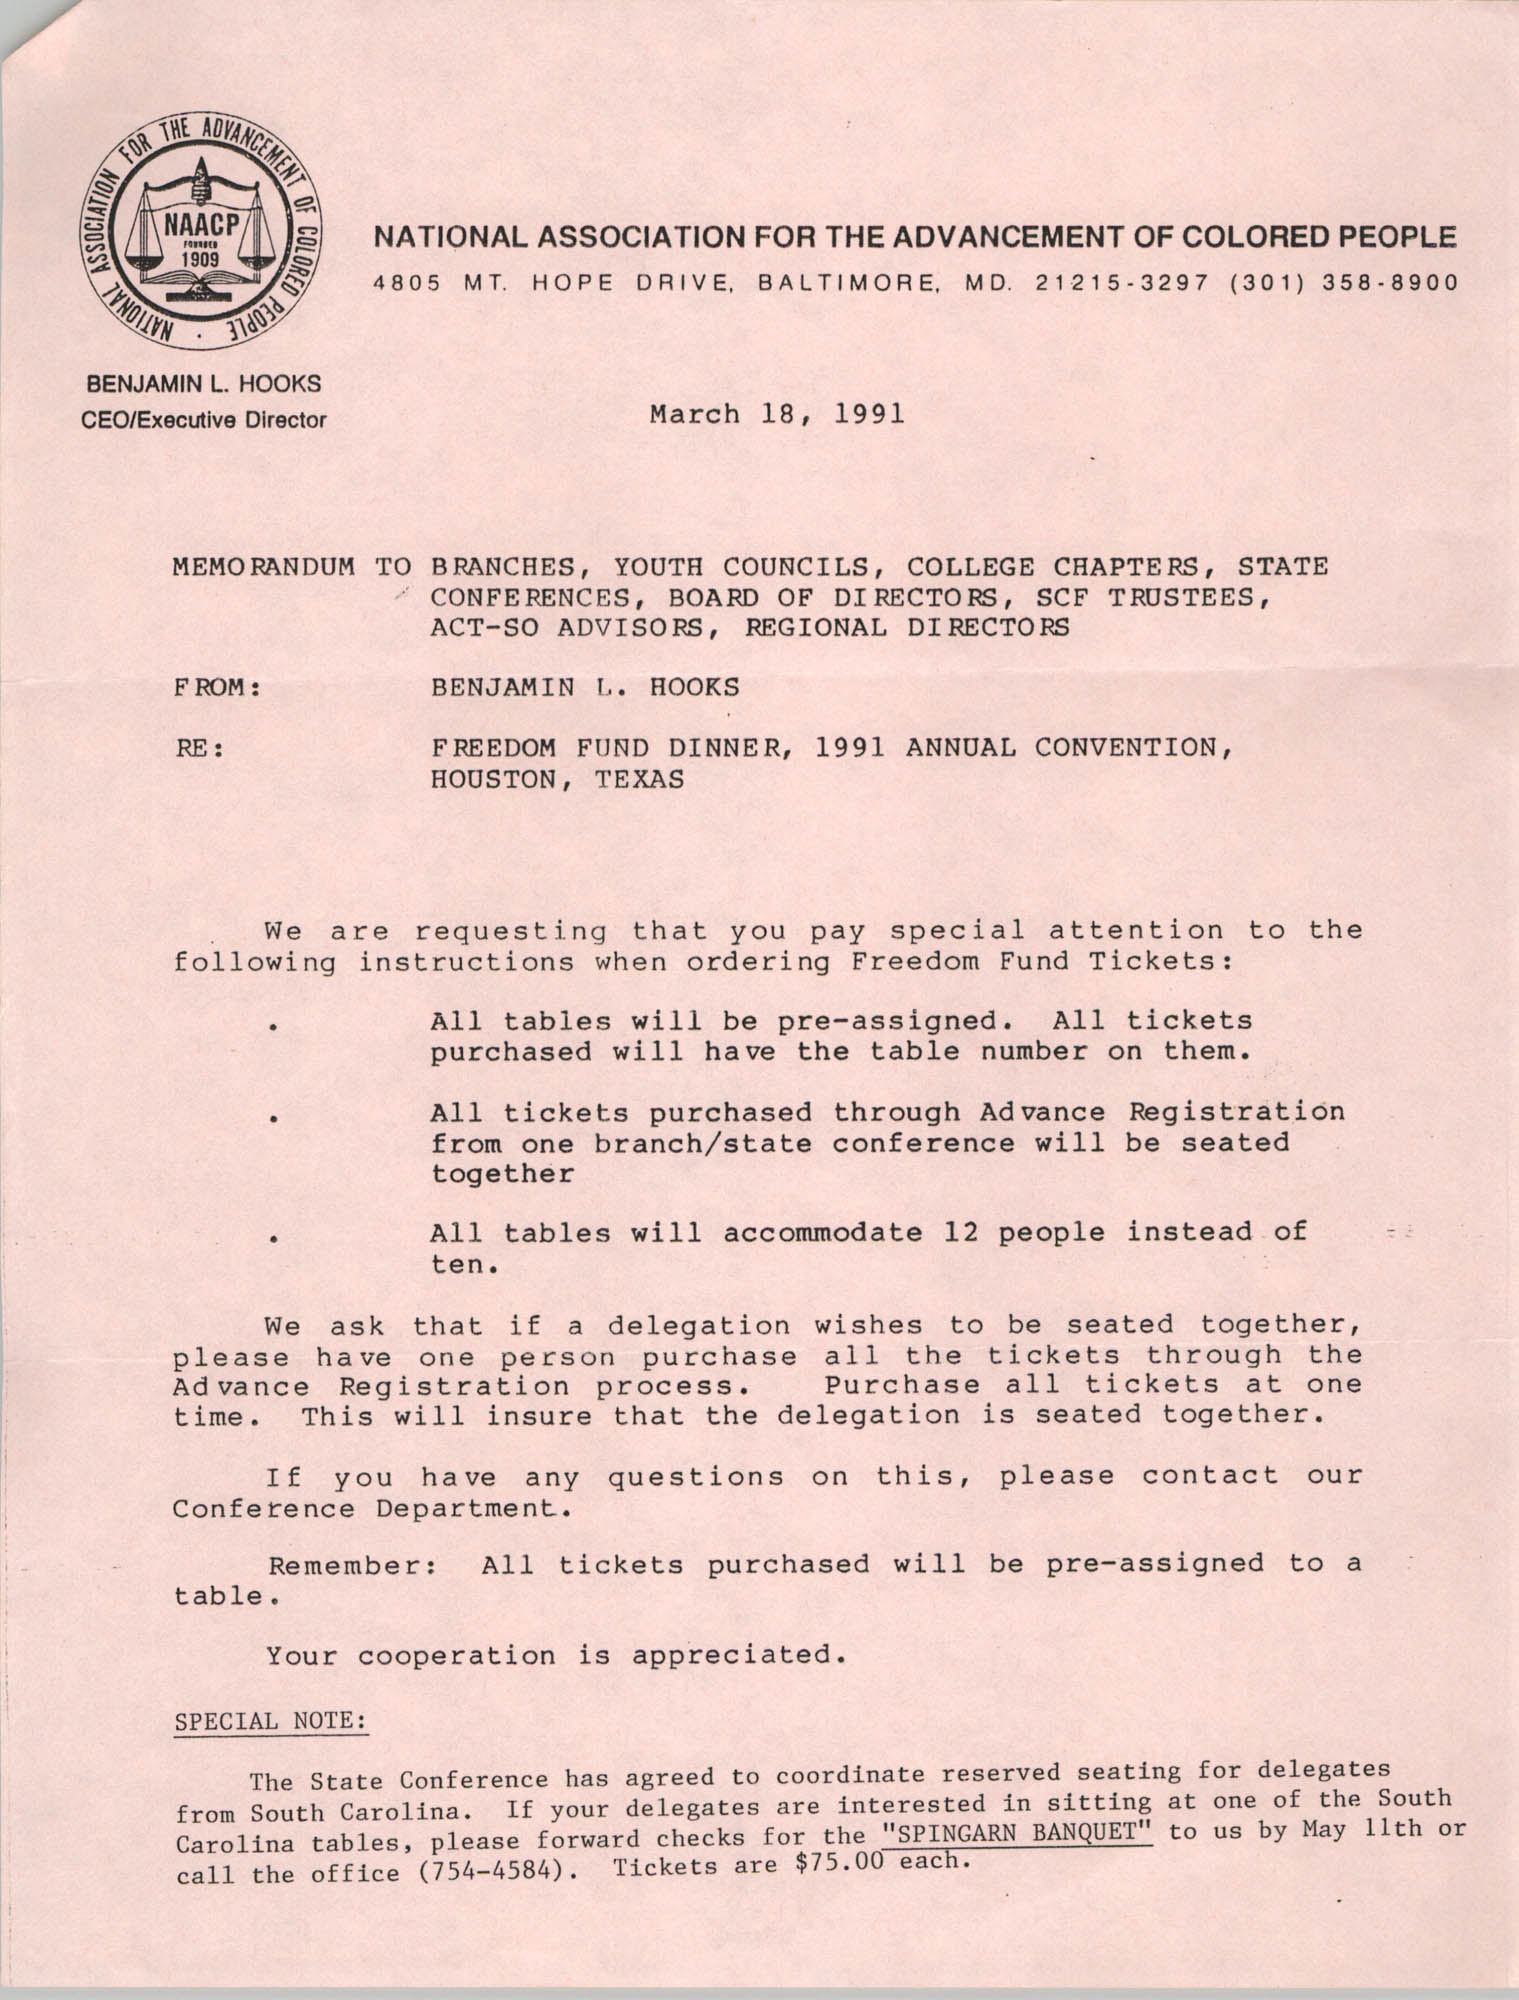 NAACP Memorandum, March 18, 1991